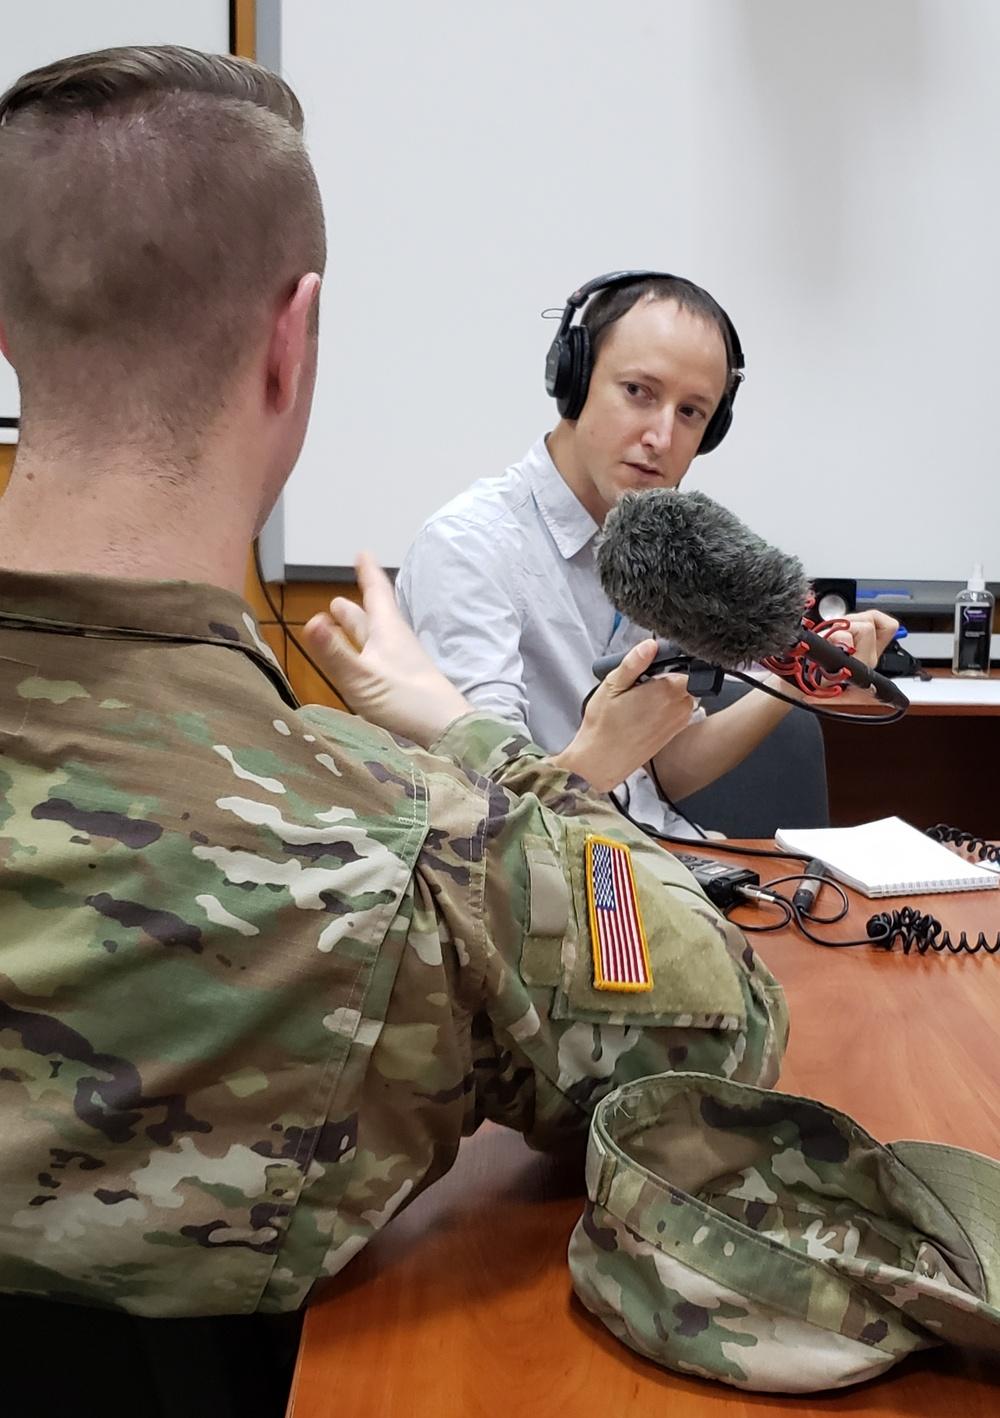 Journalists visit Joint Multinational Training Group - Ukraine